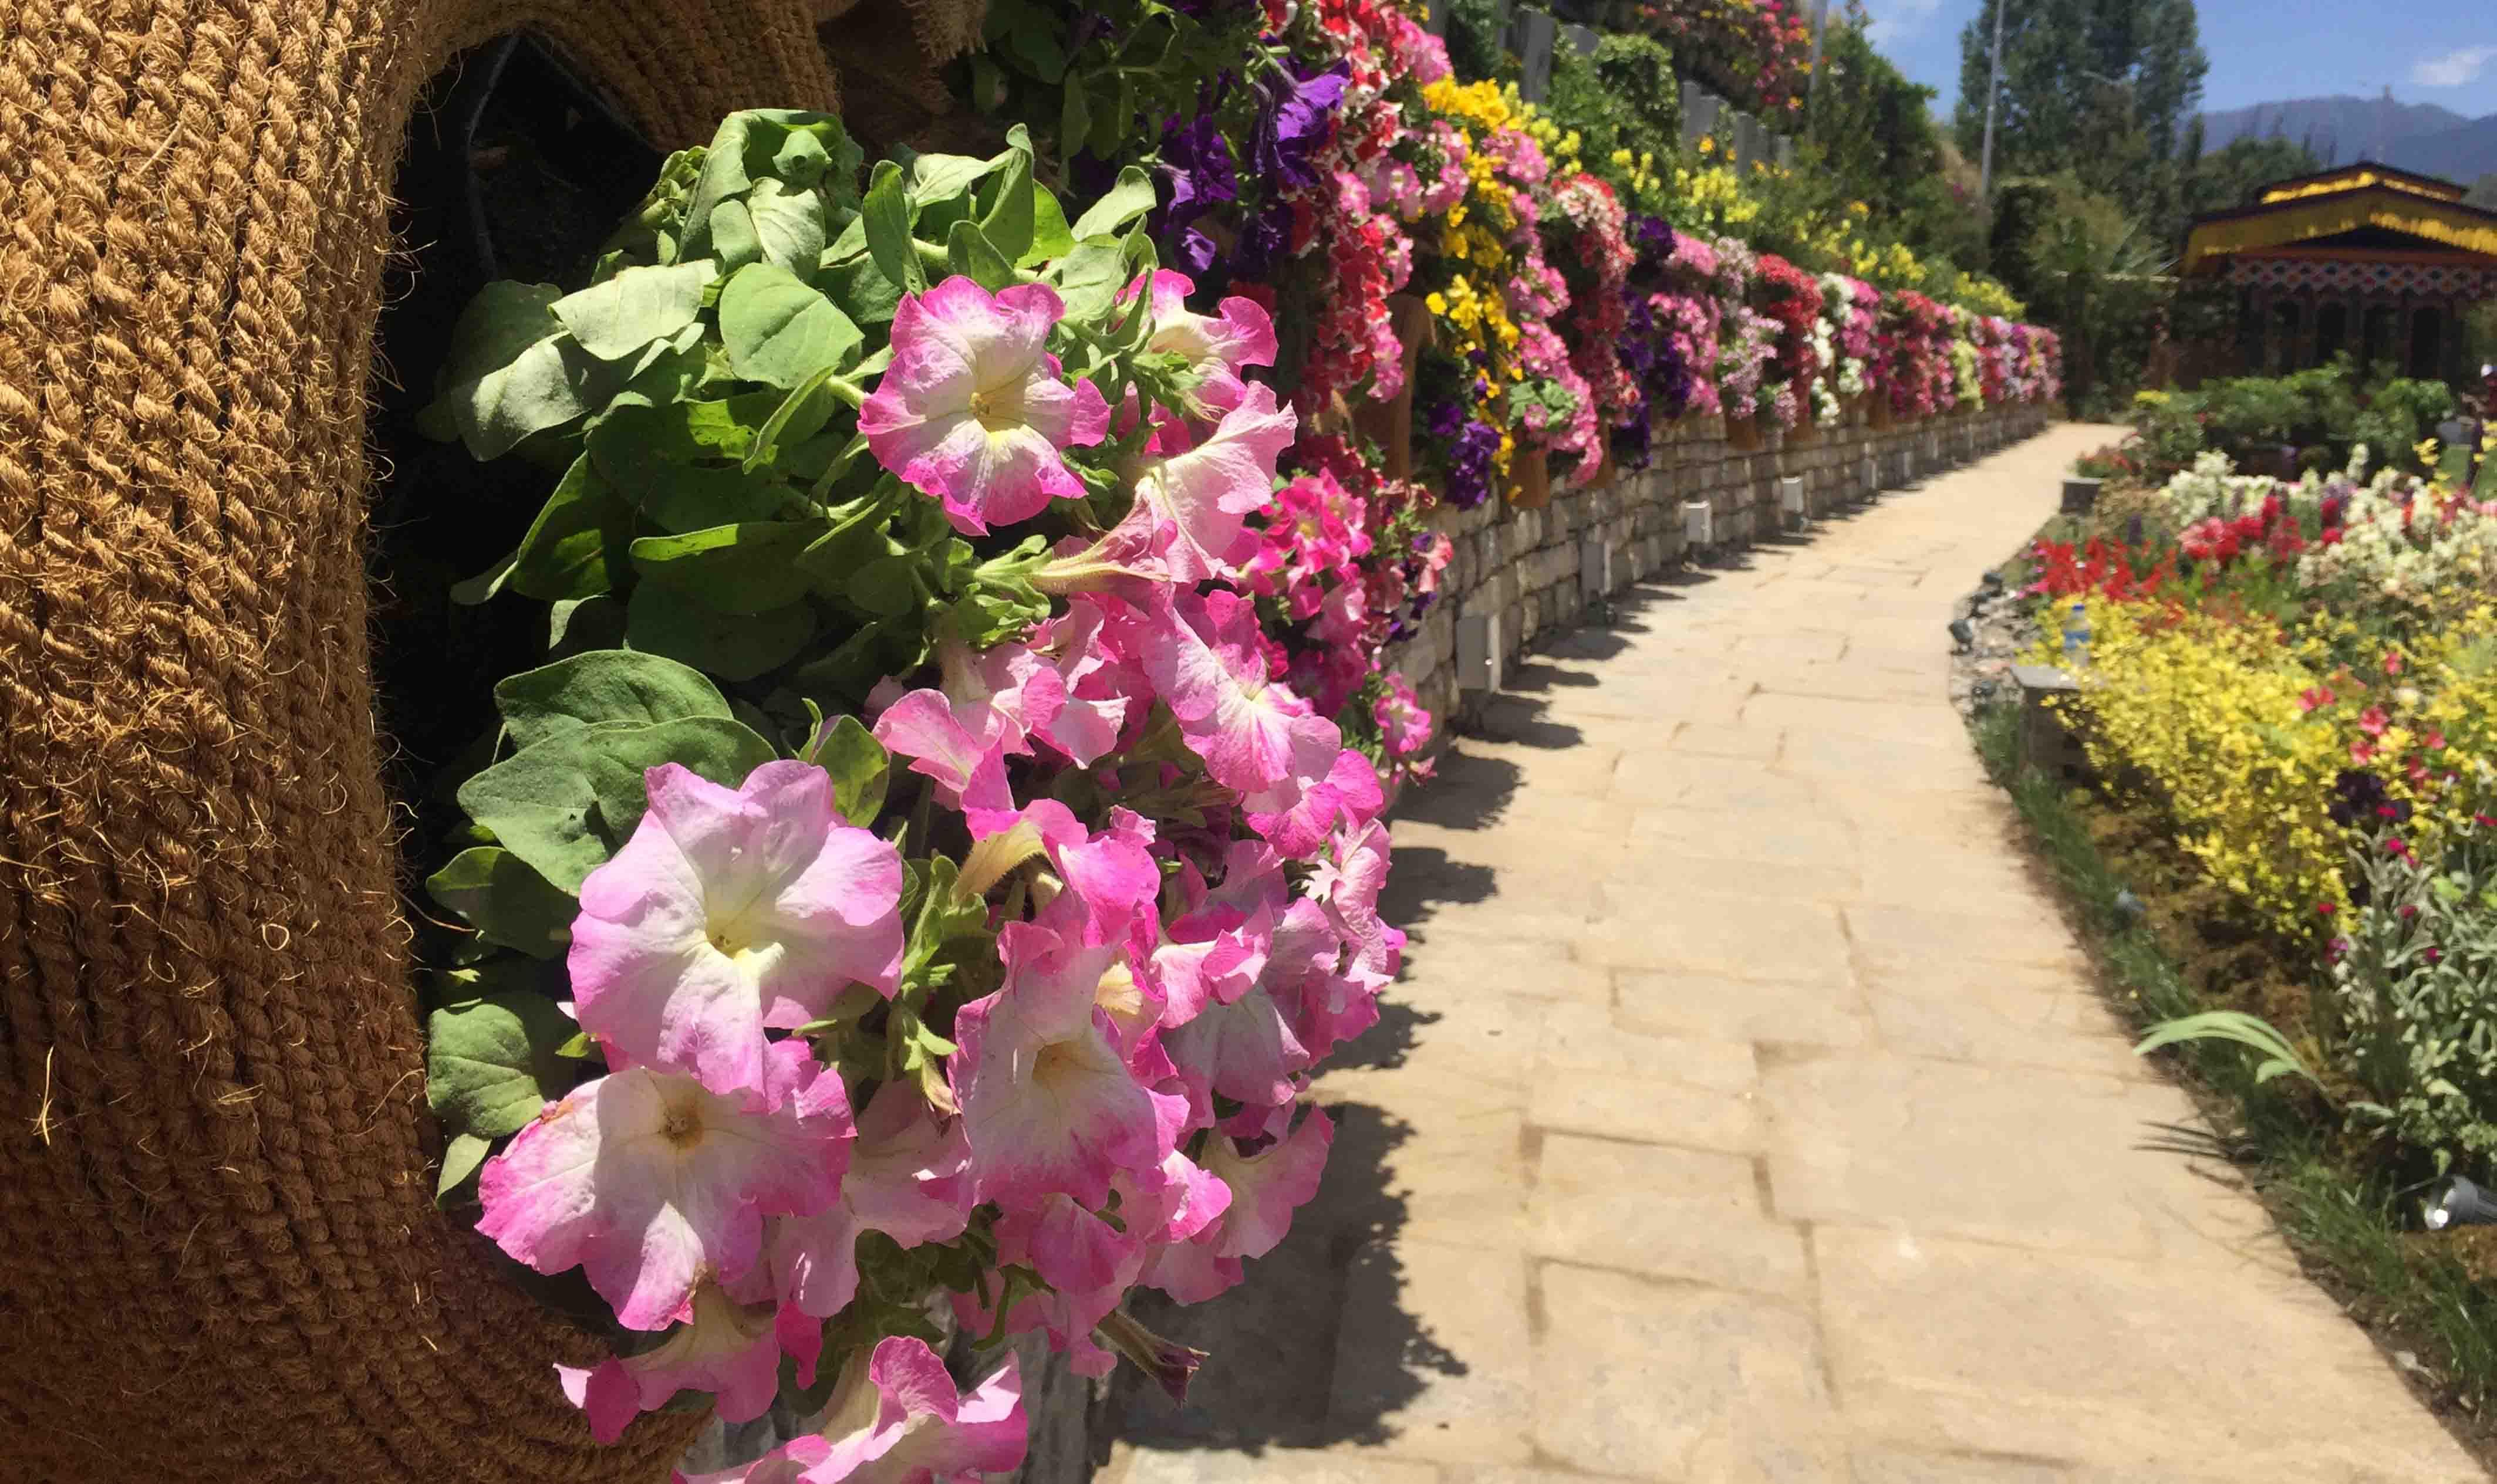 Royal Bhutan Flower Exhibition – 21 February, 2019